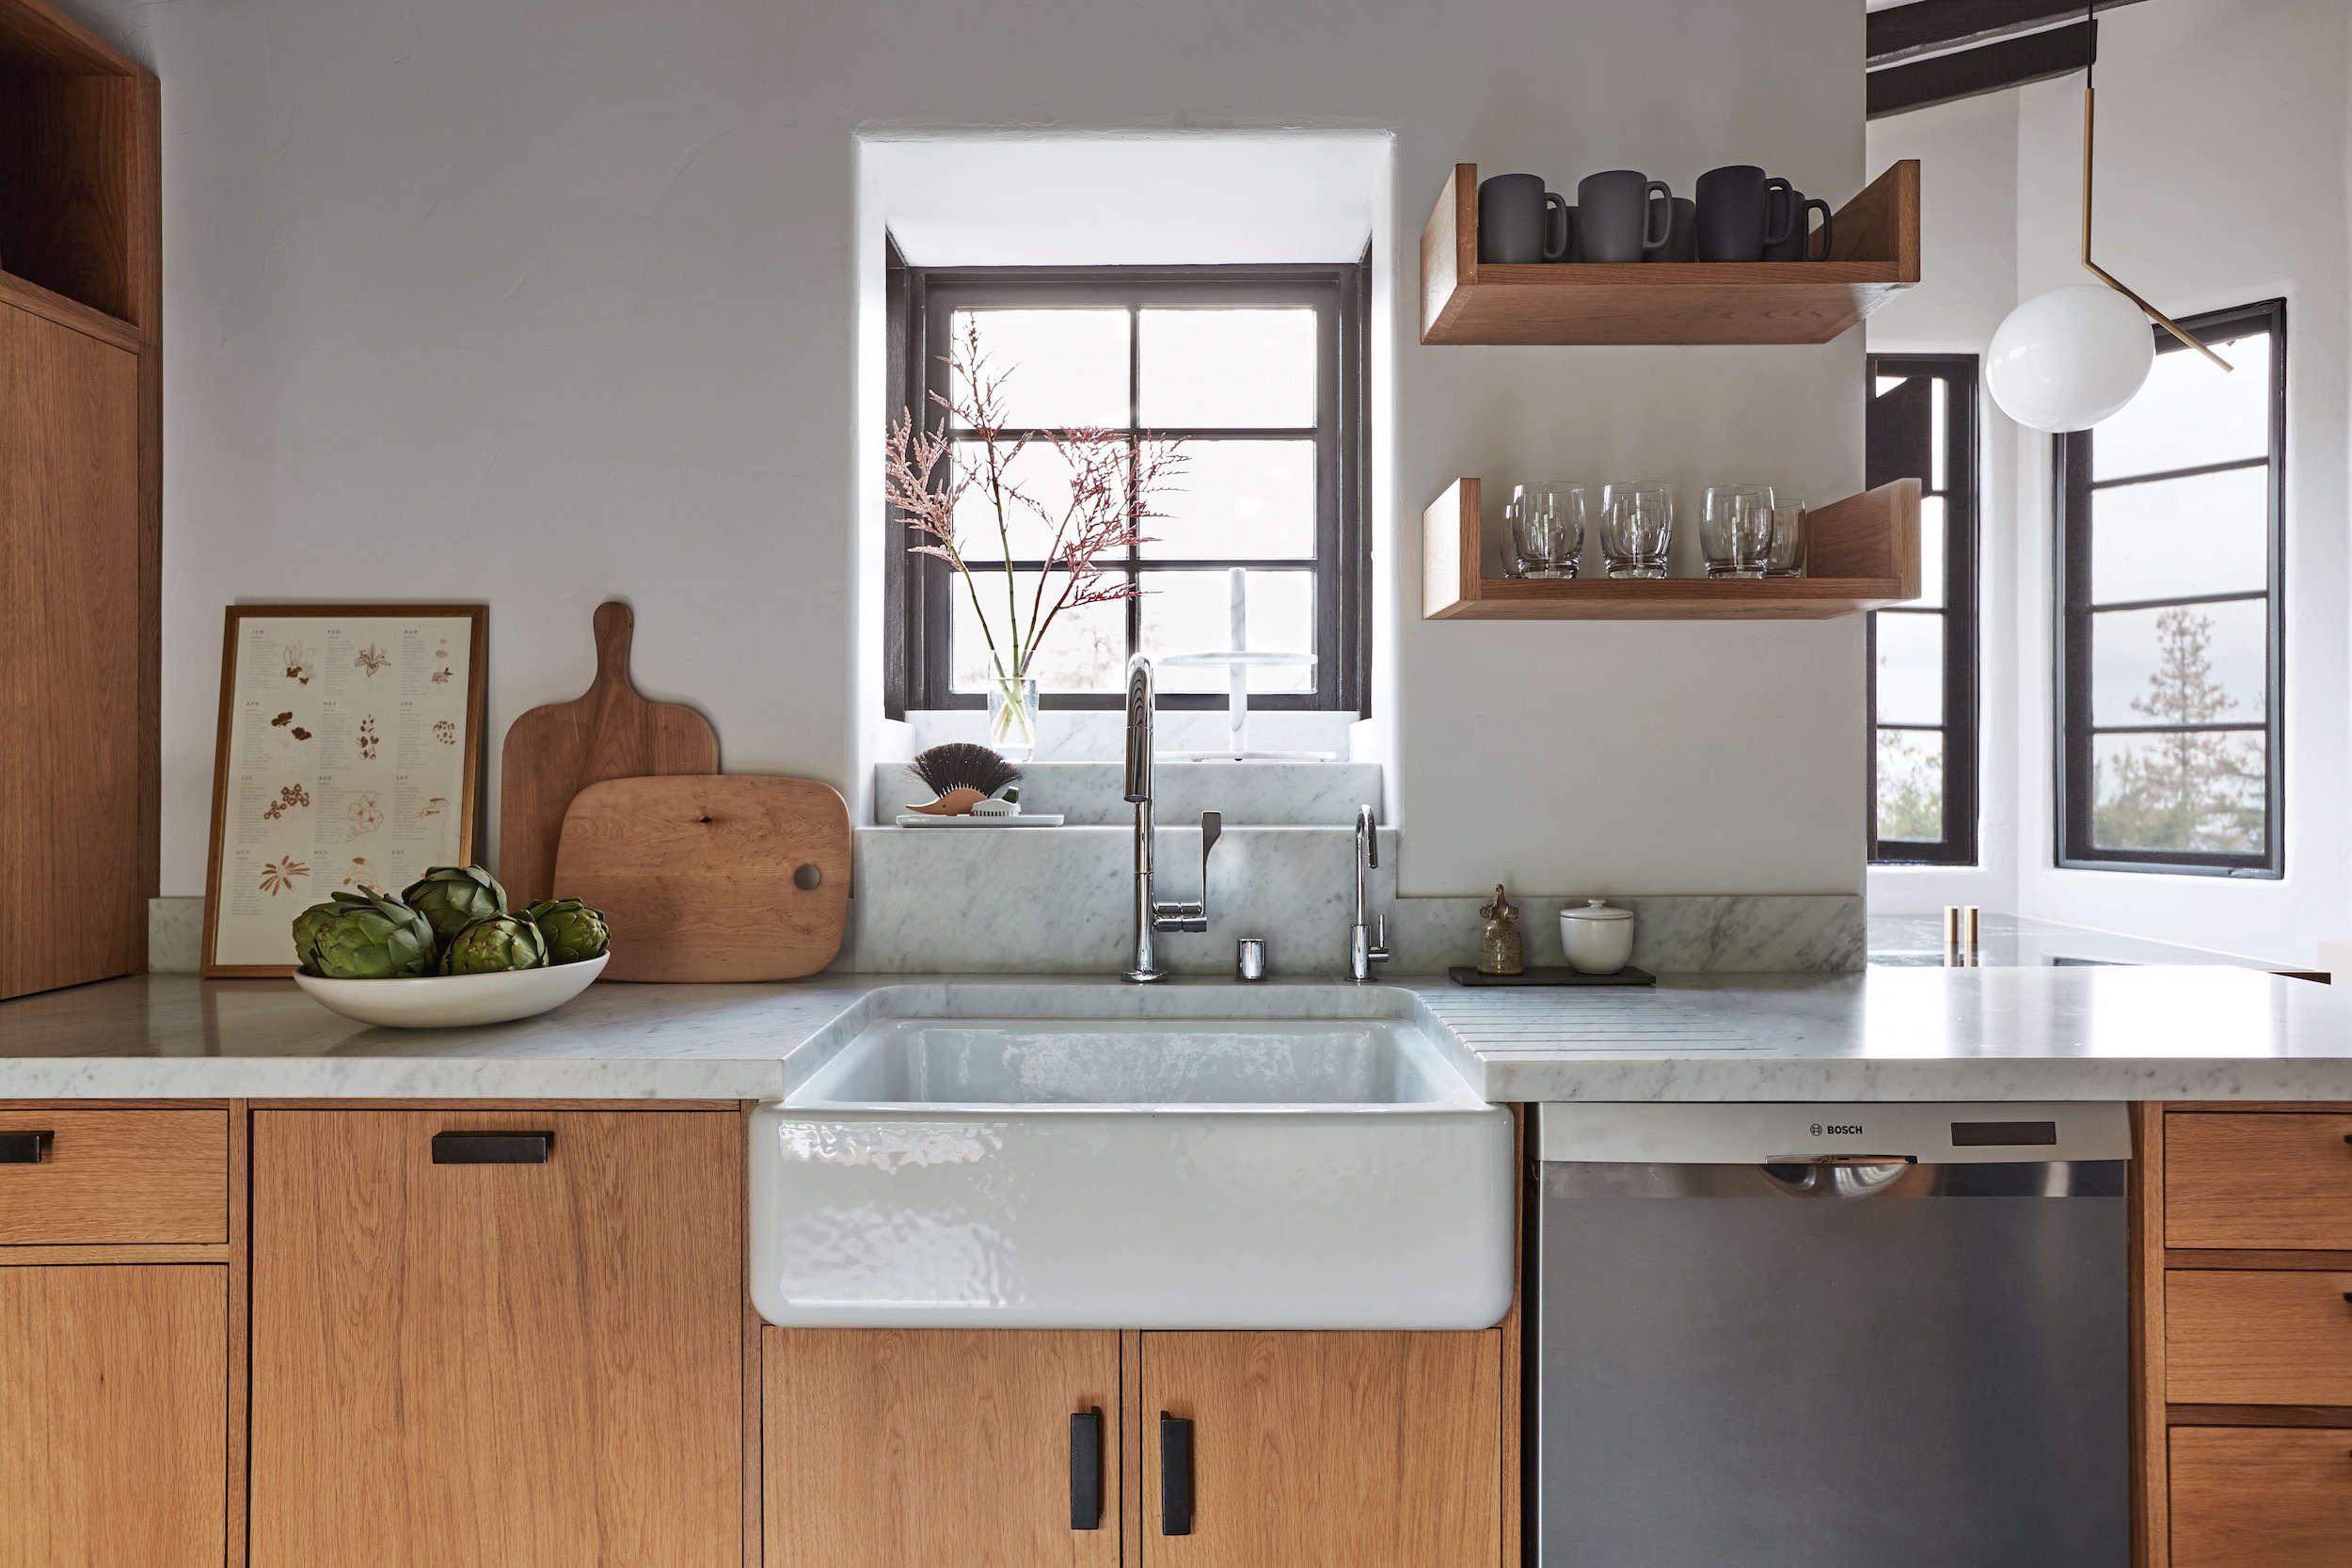 live-oak-kitchen-beamed-ceilings-wood-cabinets-jolie7